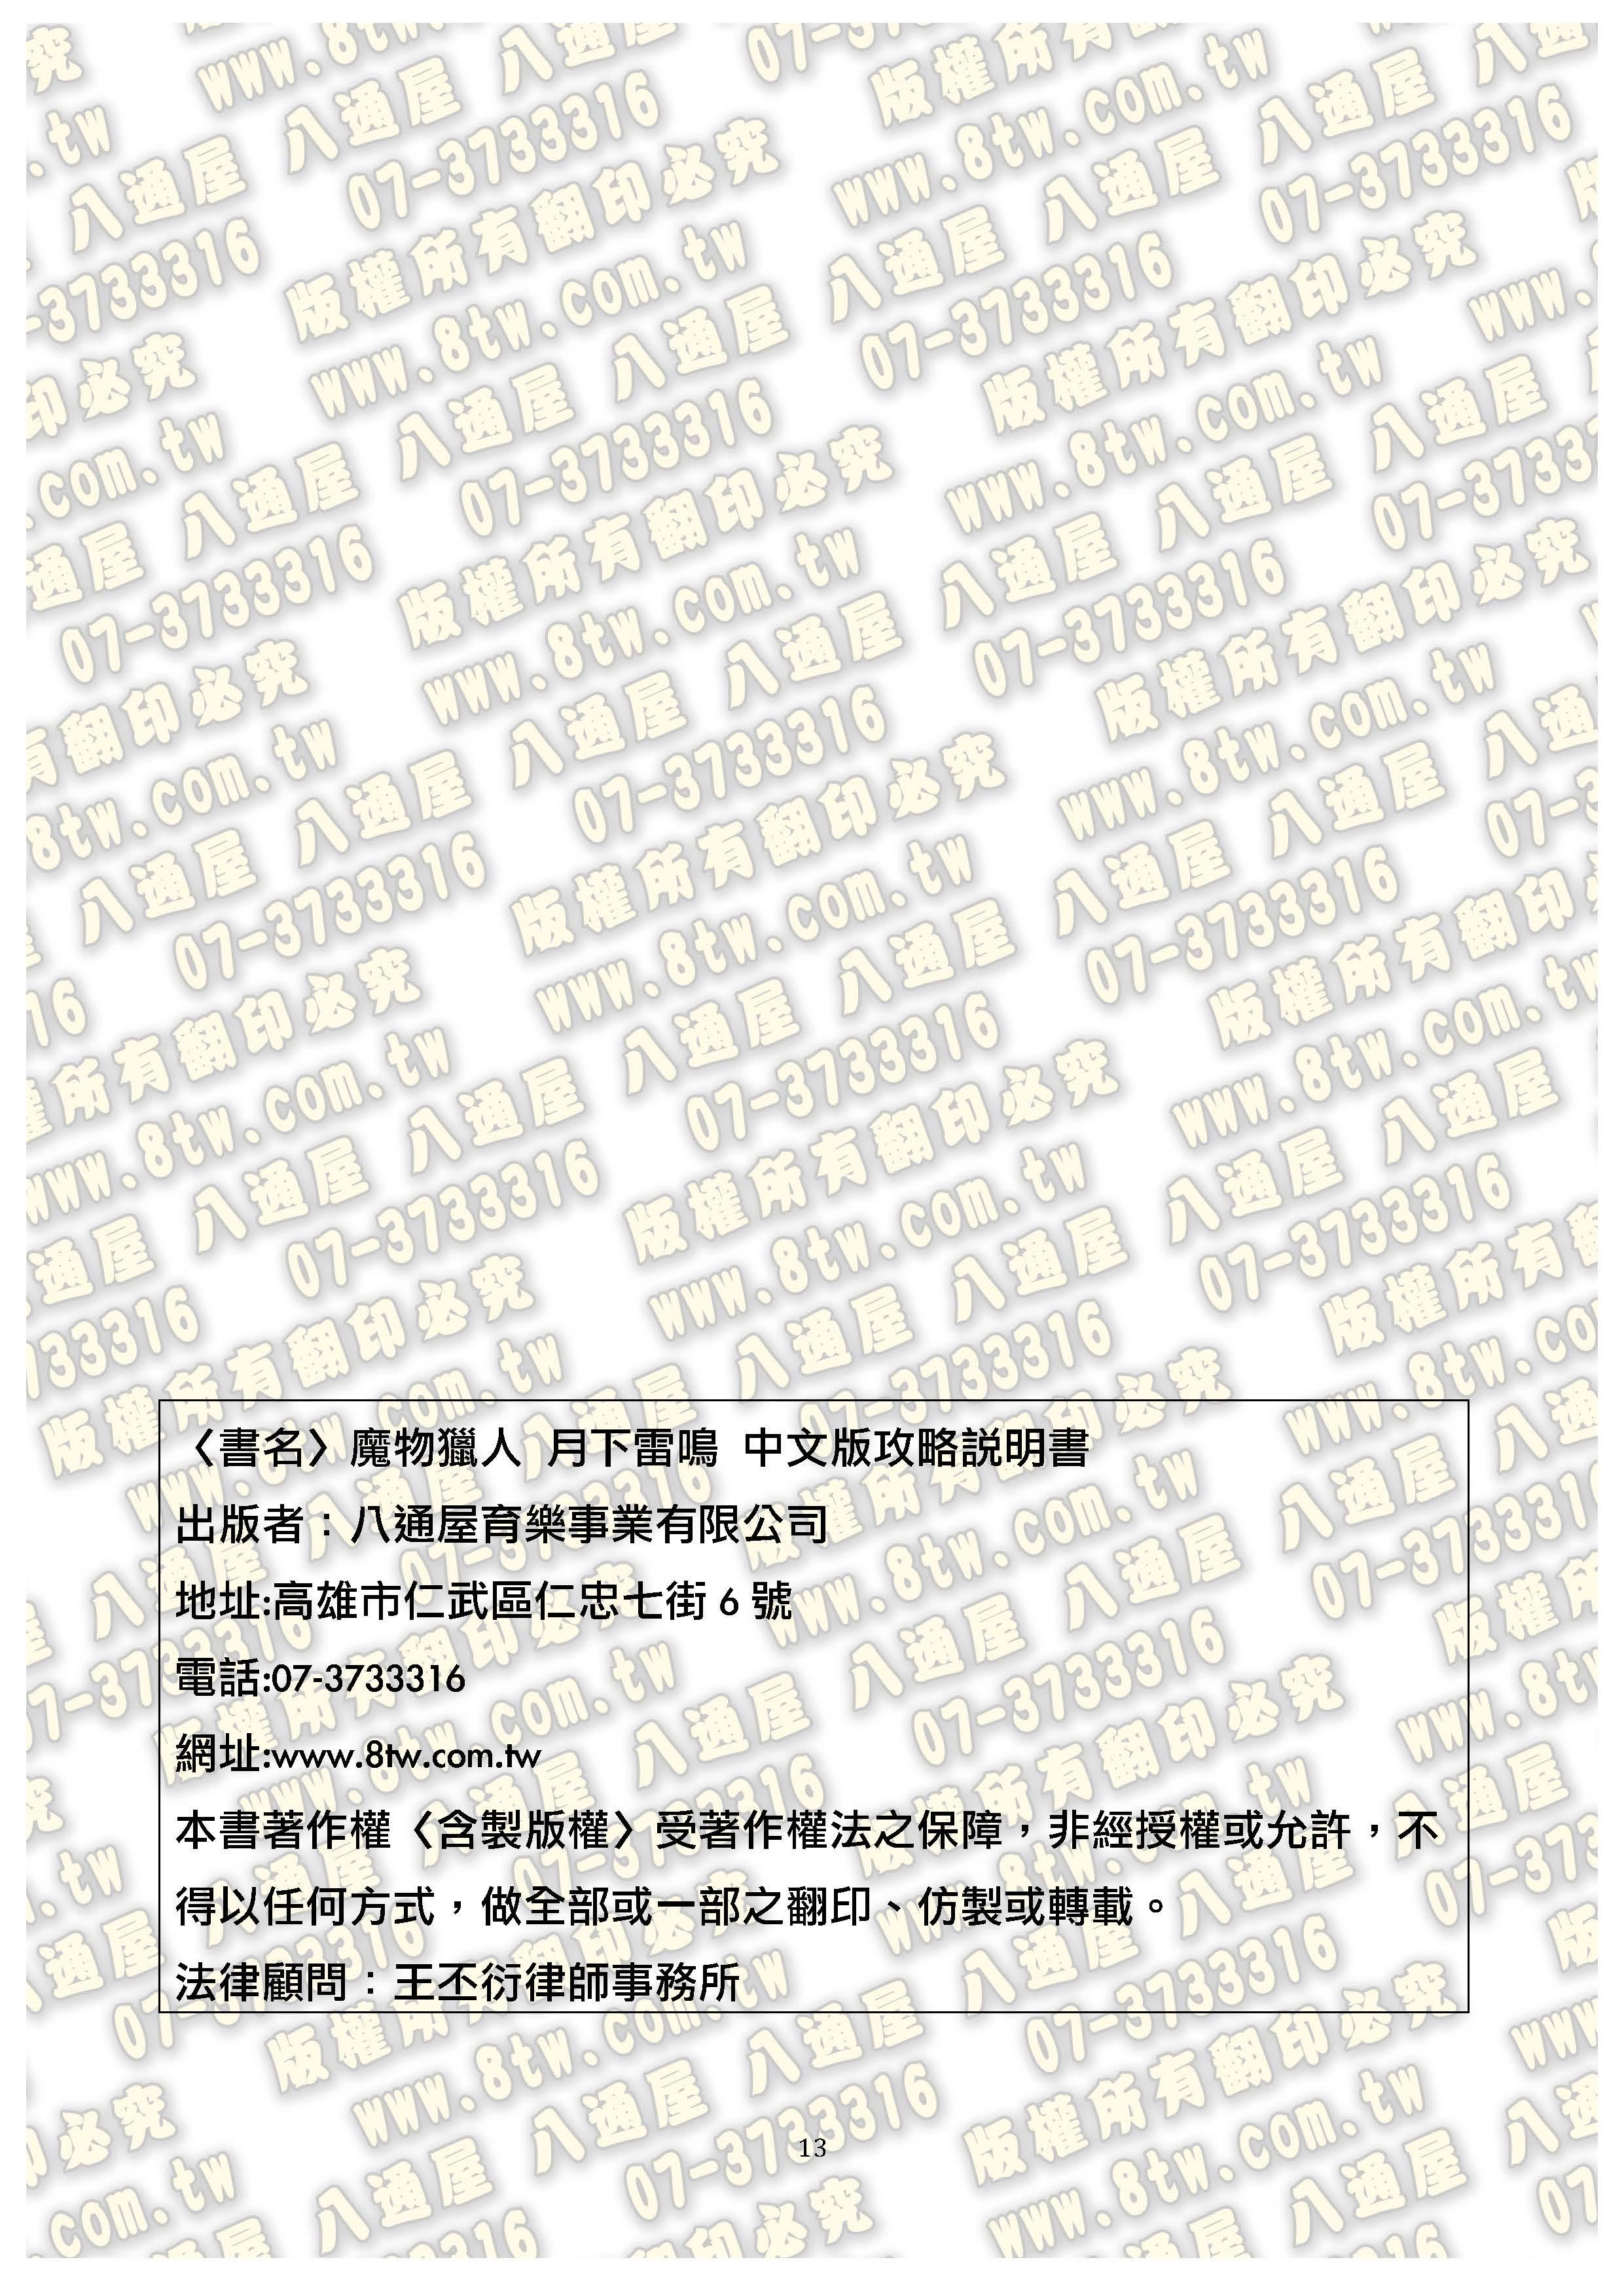 S0202魔物獵人 月下雷鳴 中文版攻略_Page_14